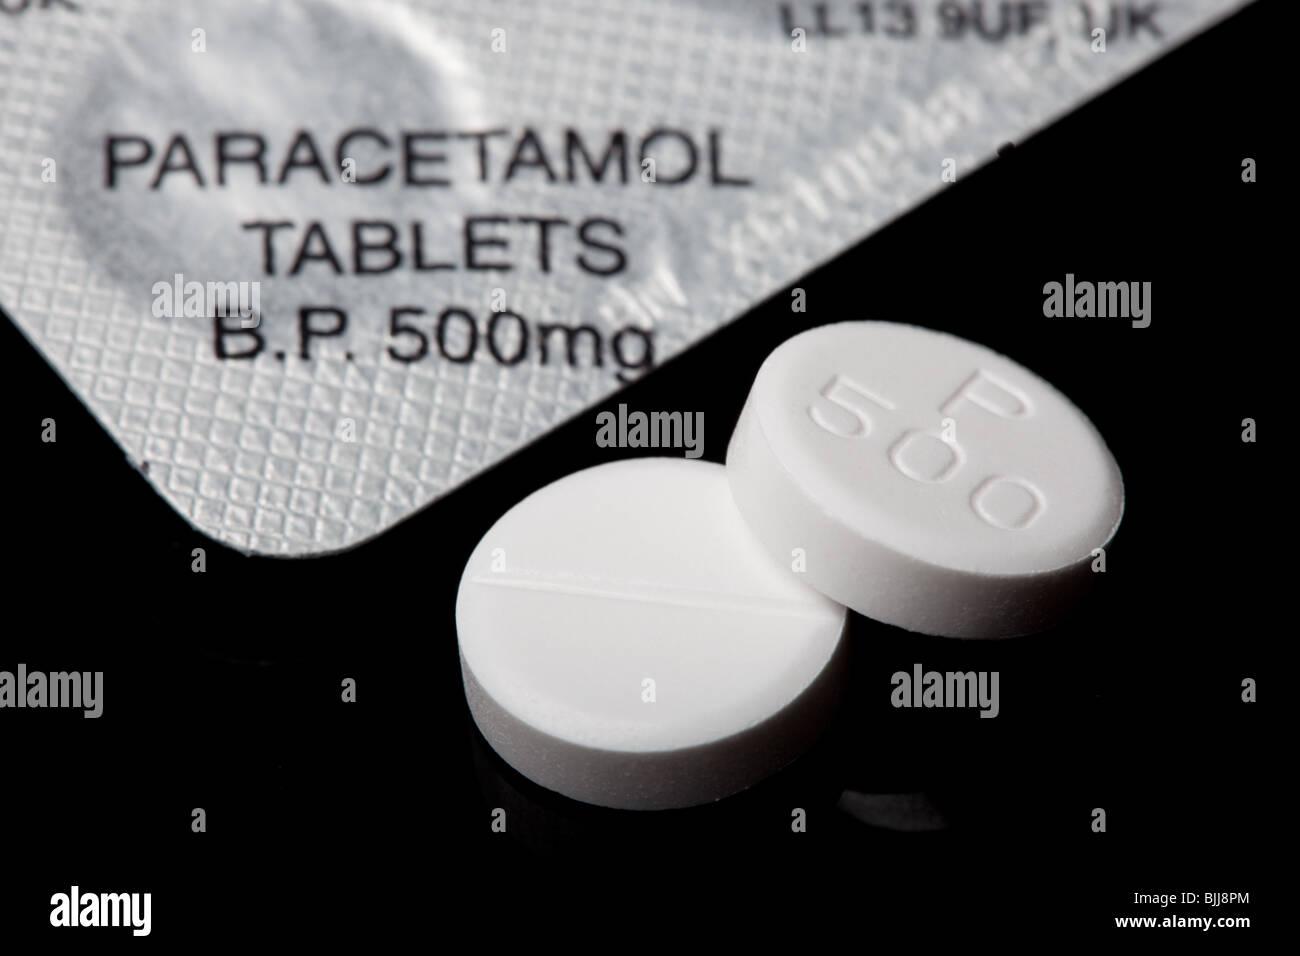 paracetamol-tablets-BJJ8PM.jpg